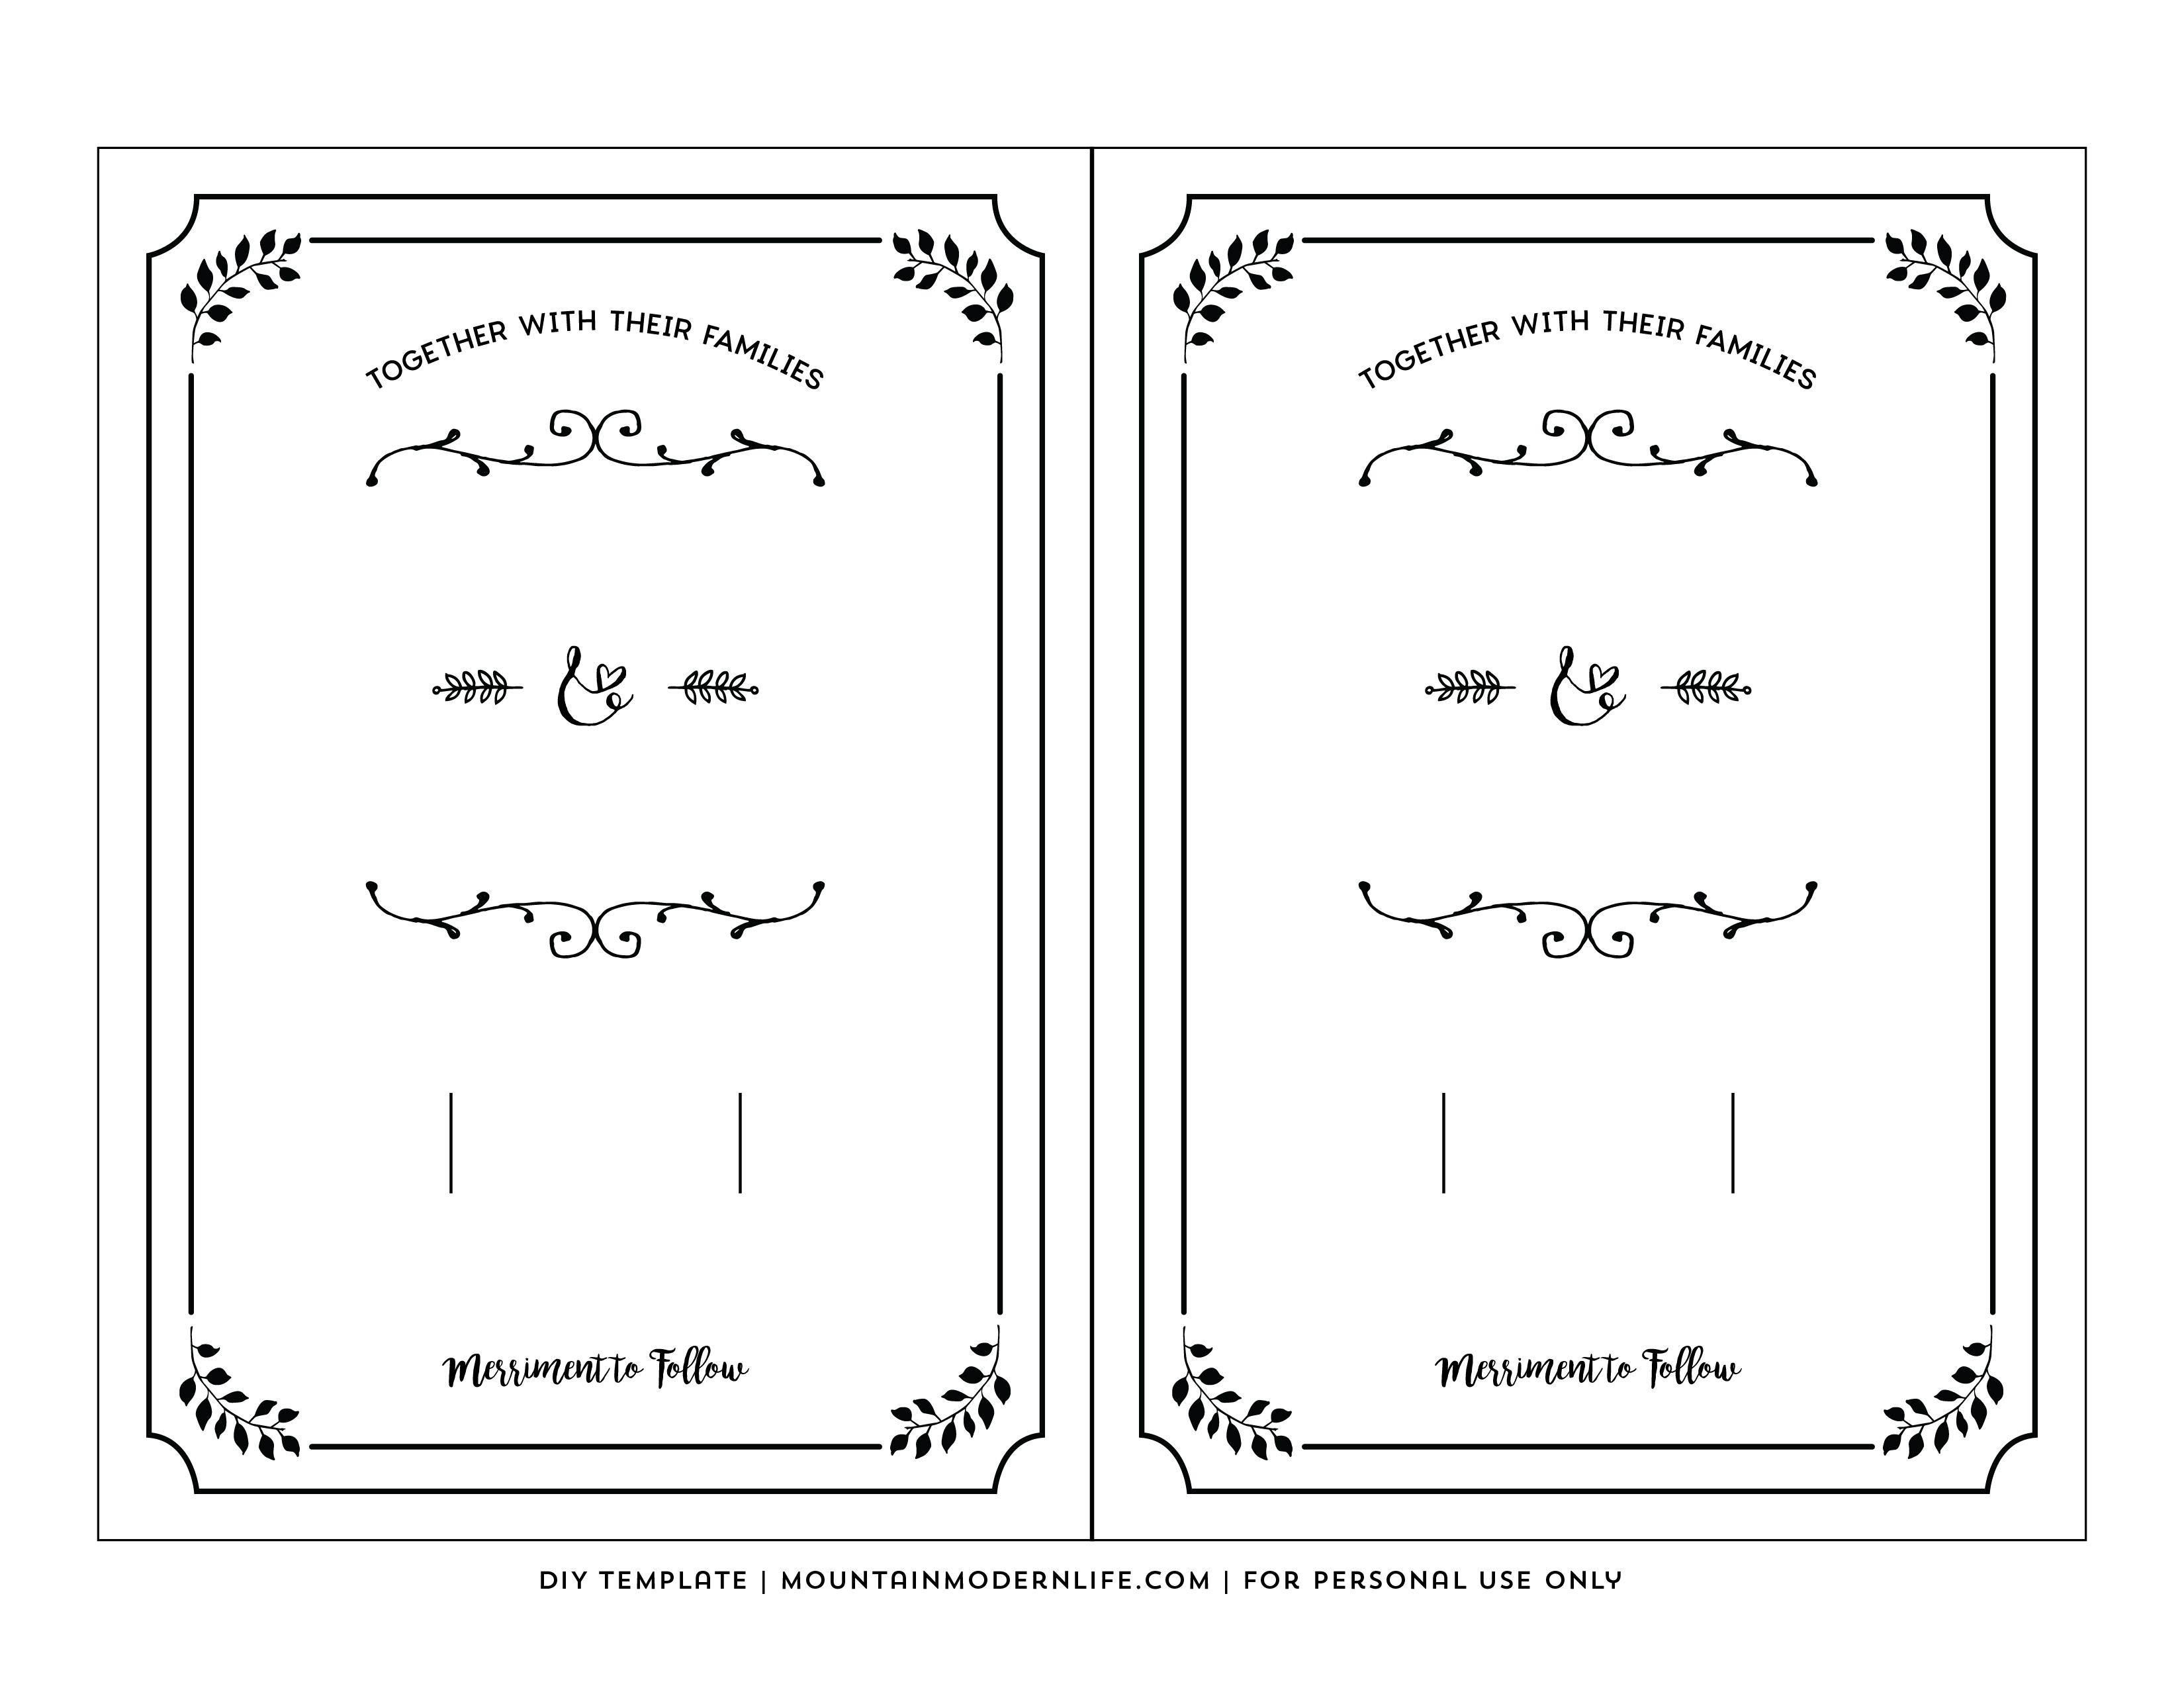 Free Printable Wedding Invitation Template - Free Printable Invitations